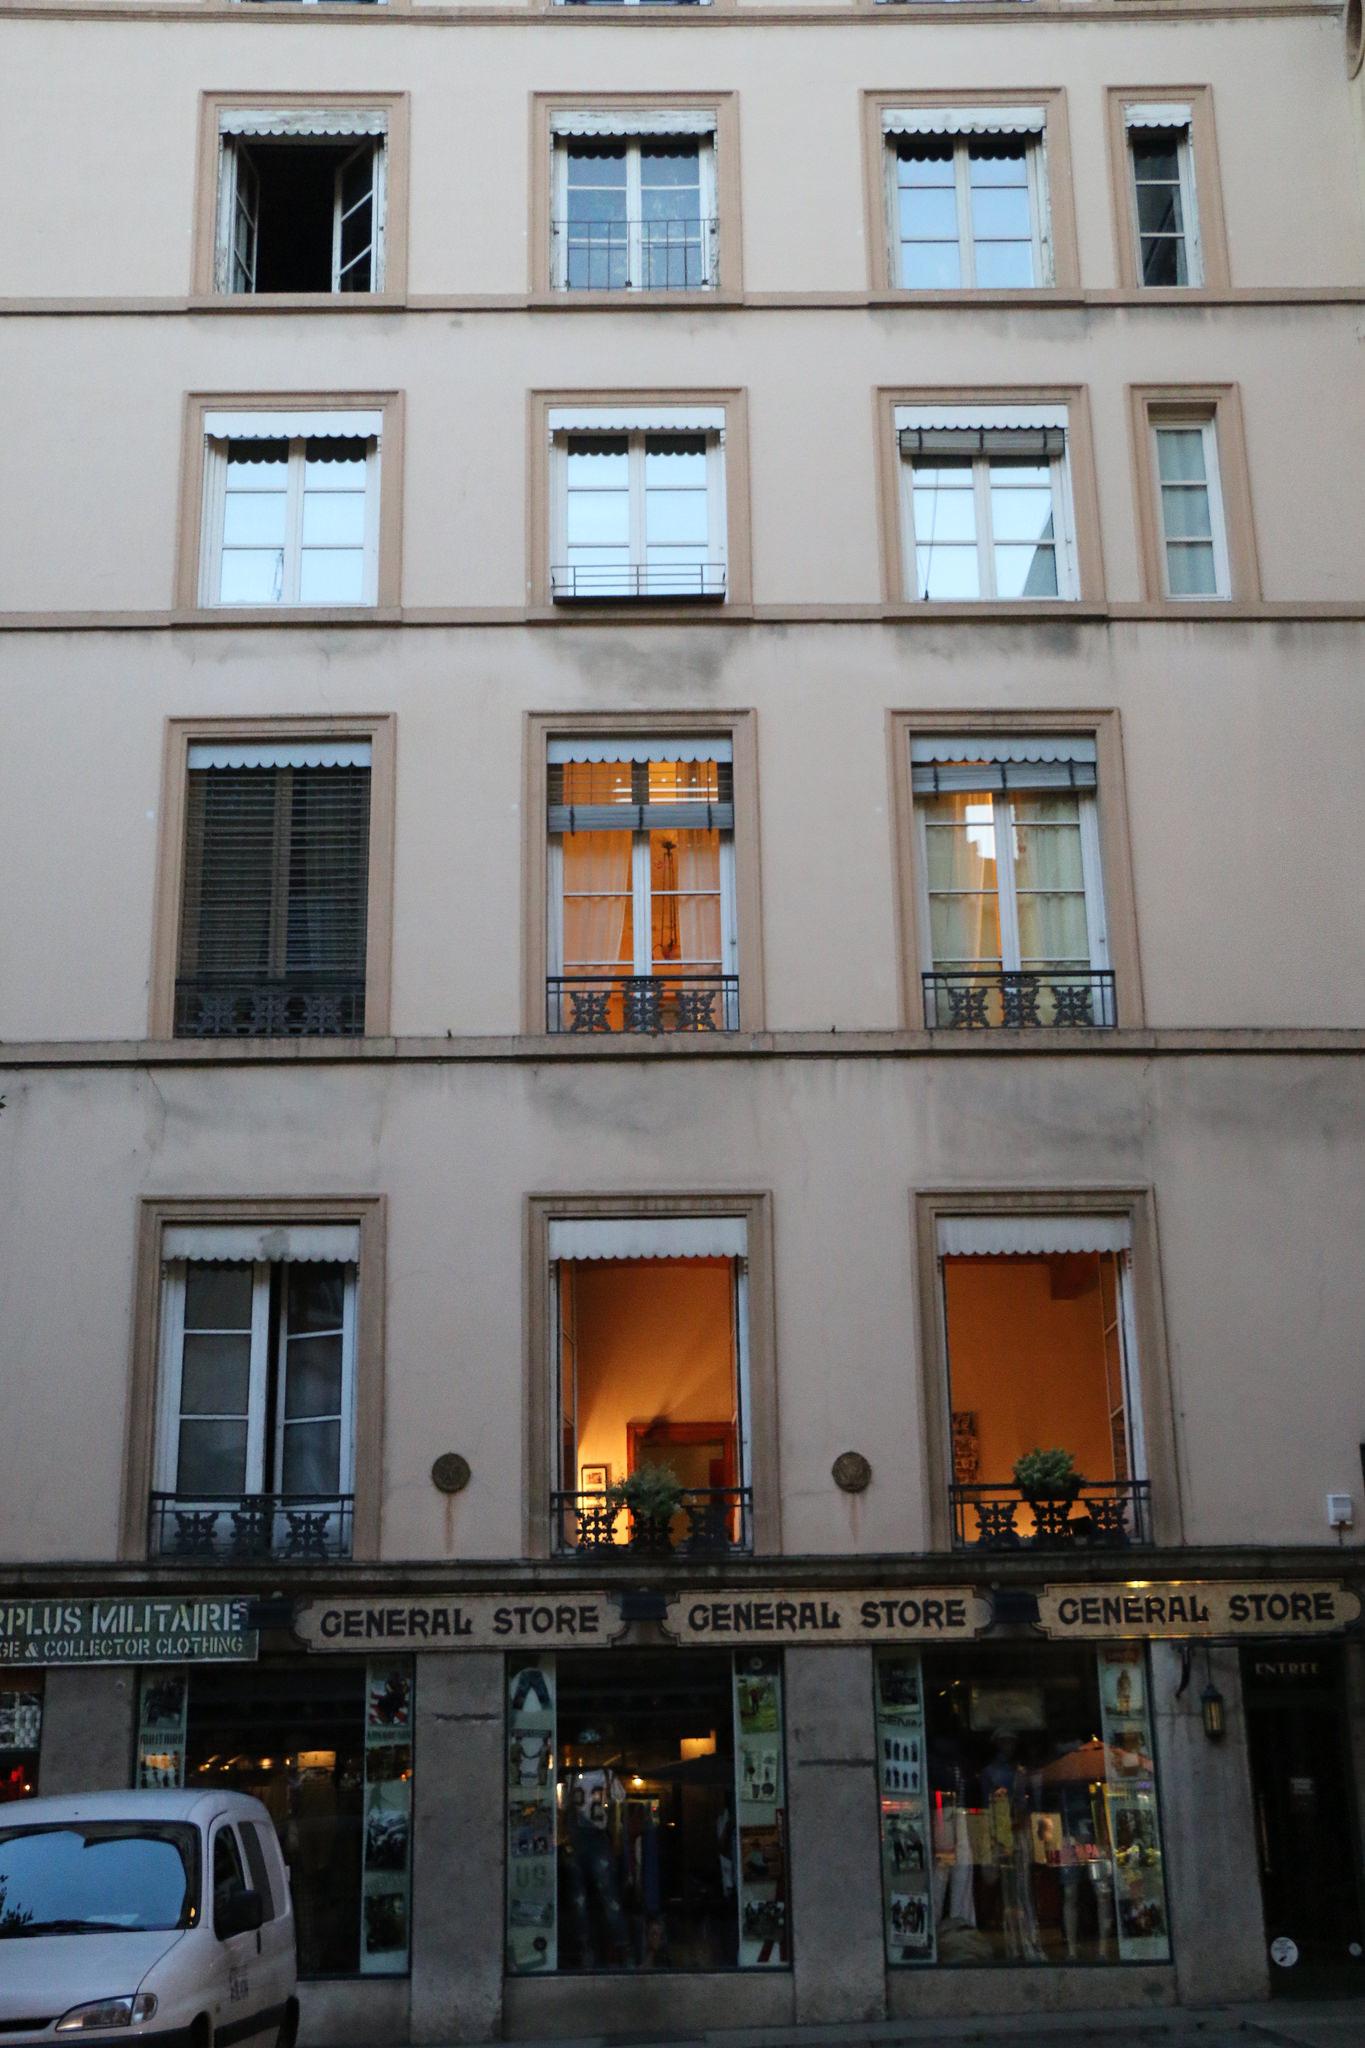 Somewhere France_23711137342_l.jpg